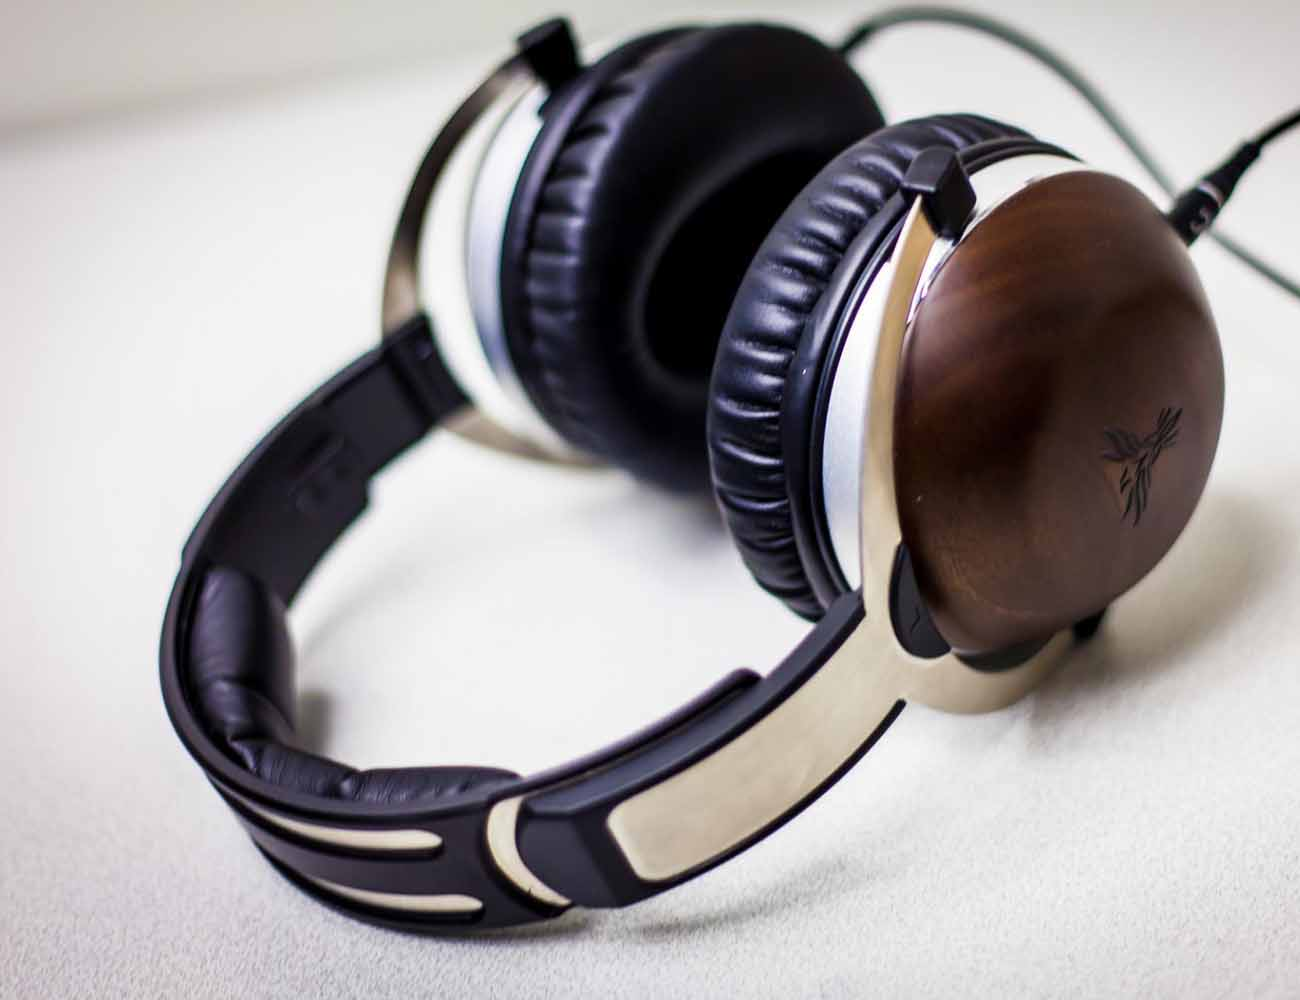 Feenix Aria Studio Grade Gaming Headset and Mic